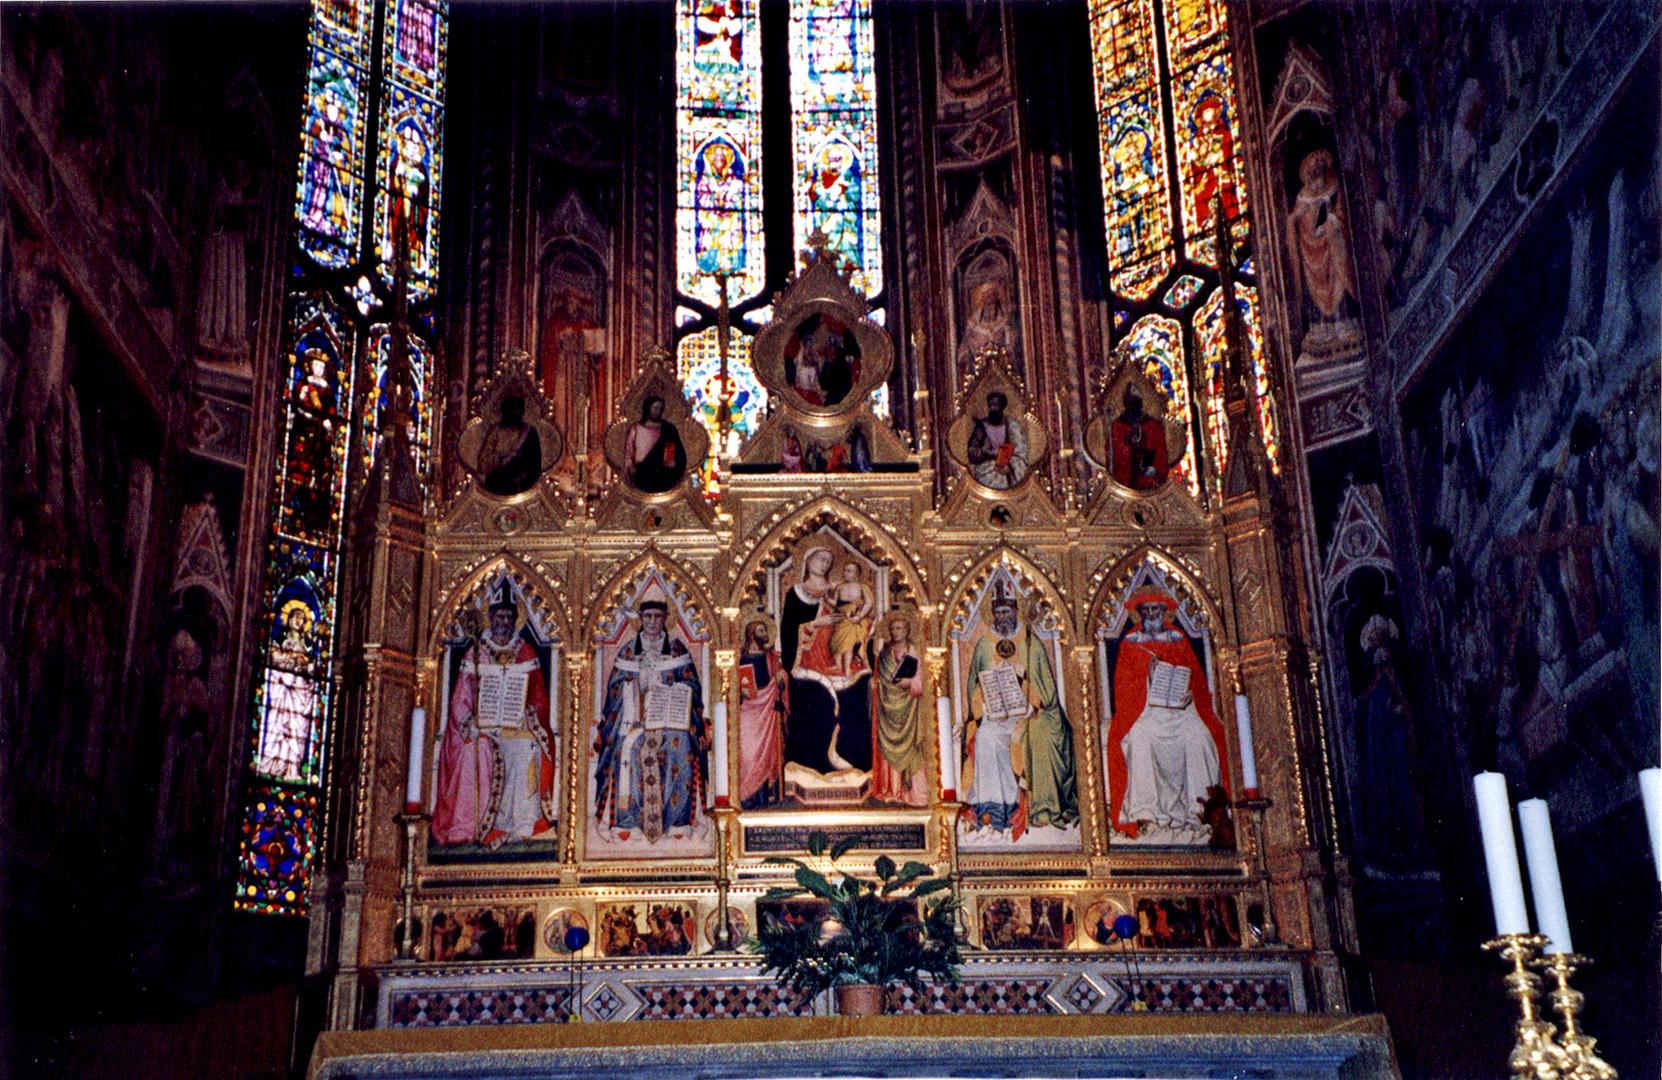 Basilica of Santa Croce Altar, Giovanni del Biondo's Virgin and Saints